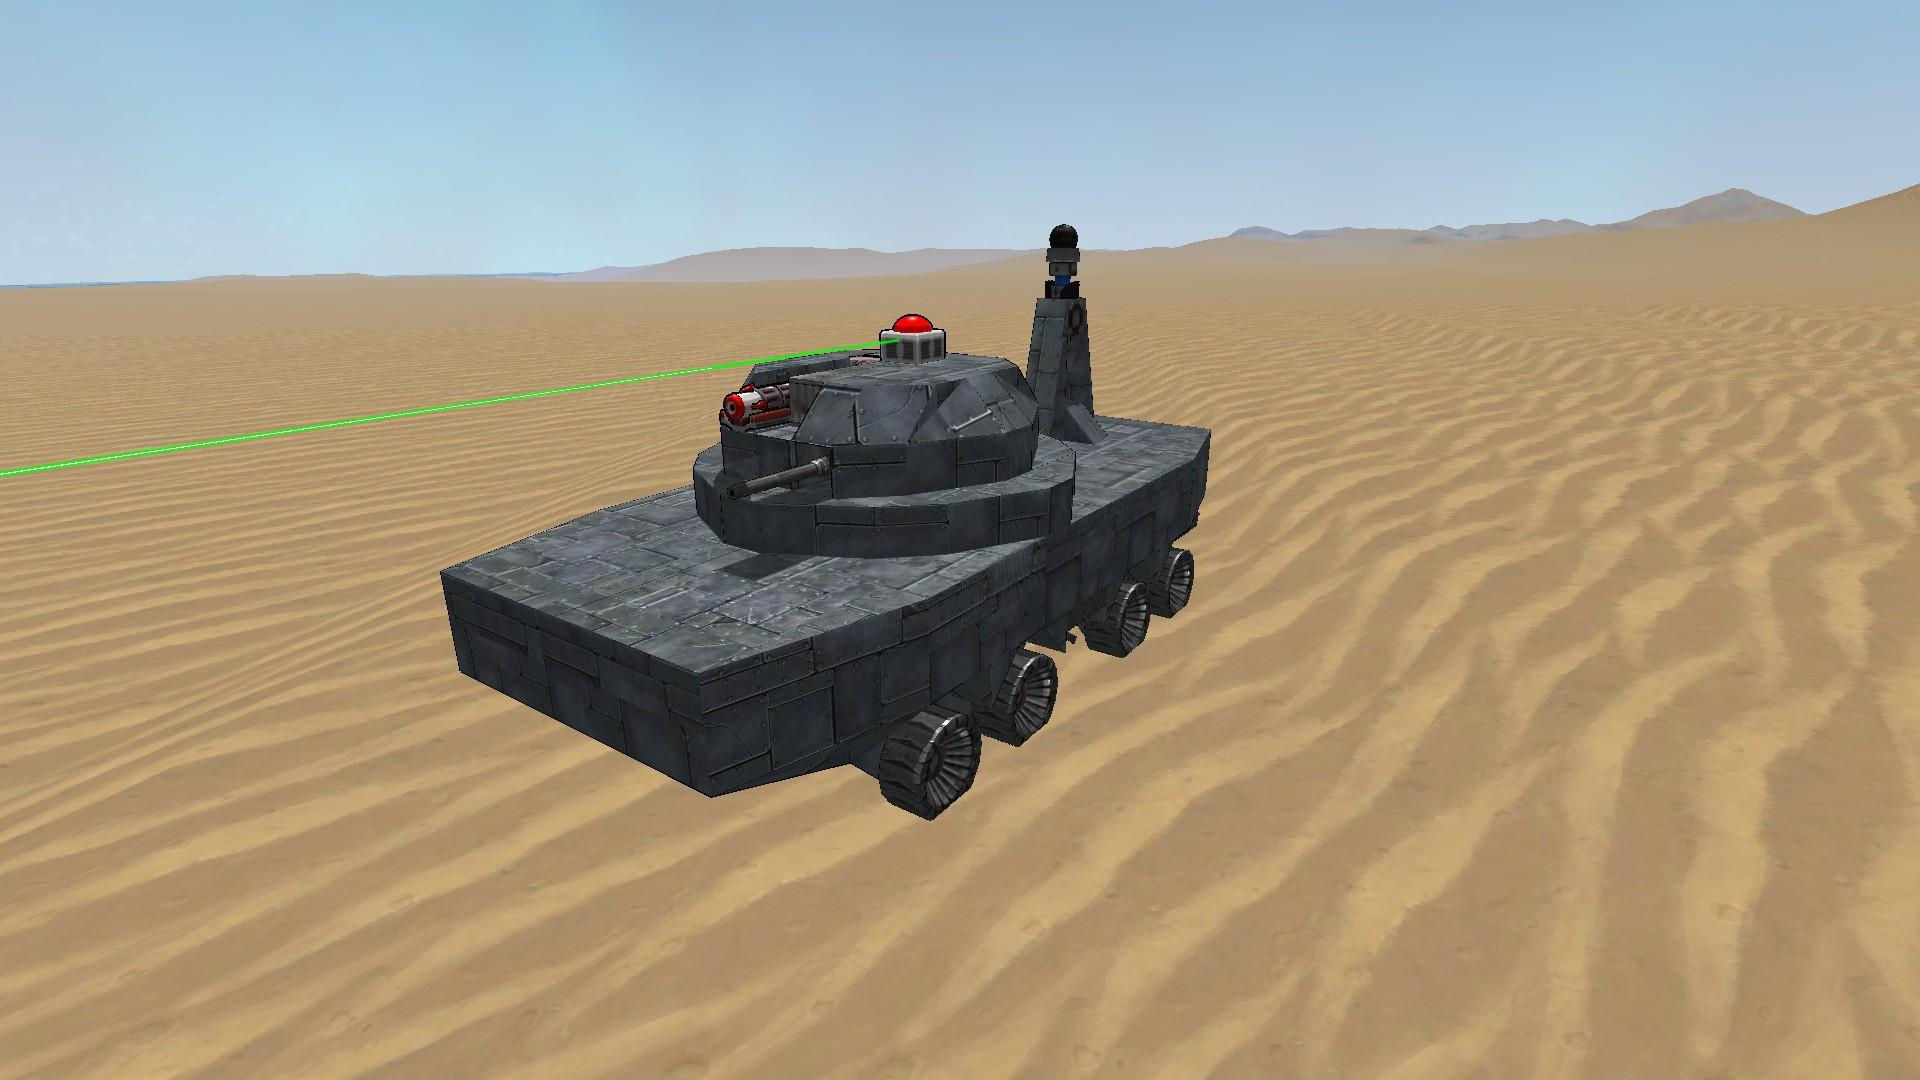 1/35) APC - Scott Robertson. Hmm, the new Moebius Batmobile model ...